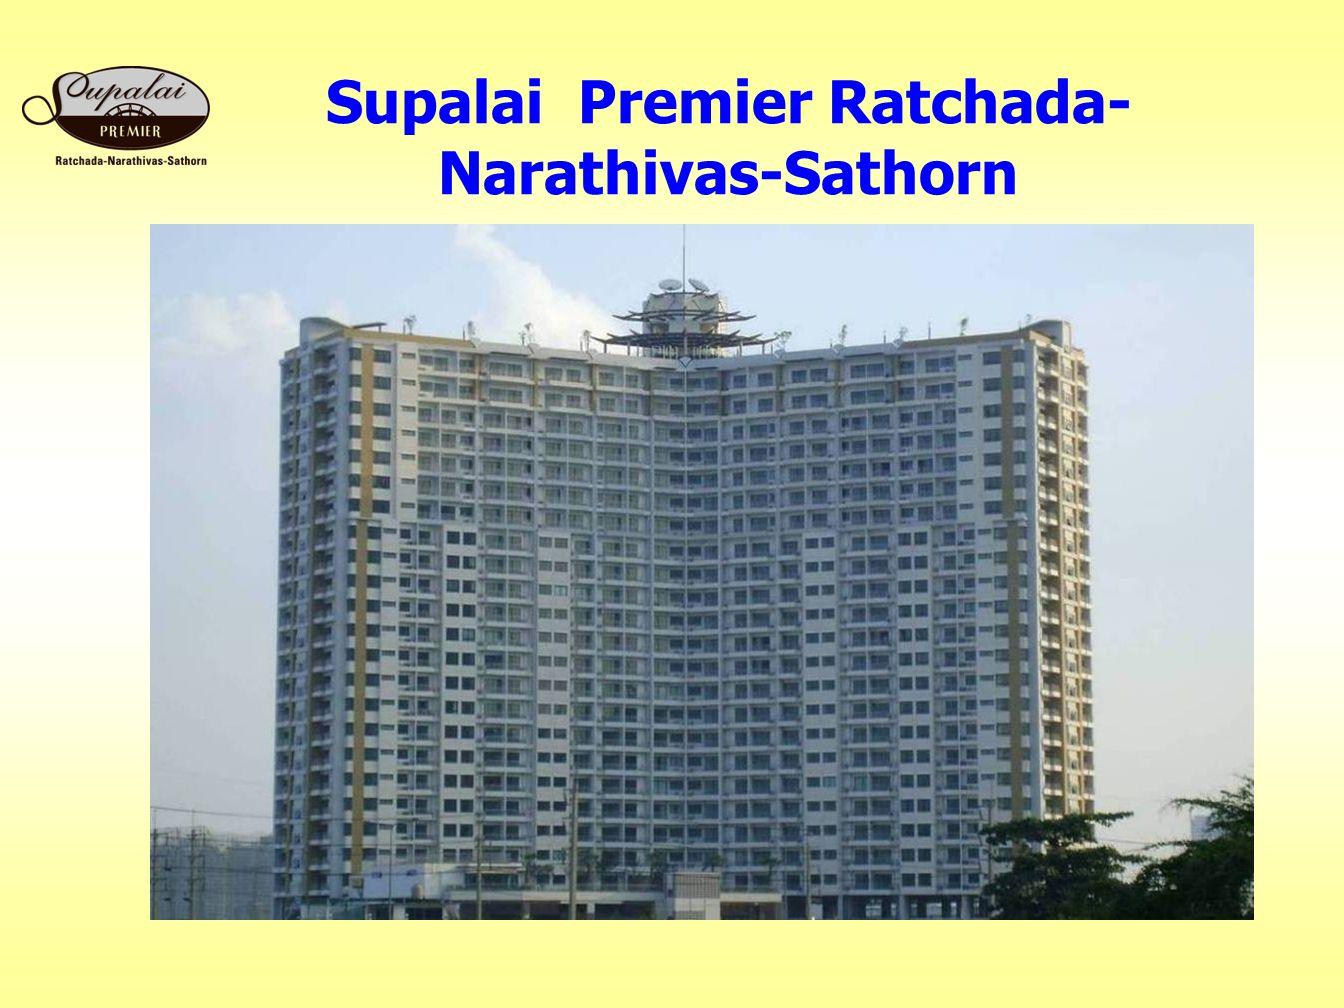 Supalai Premier Ratchada- Narathivas-Sathorn